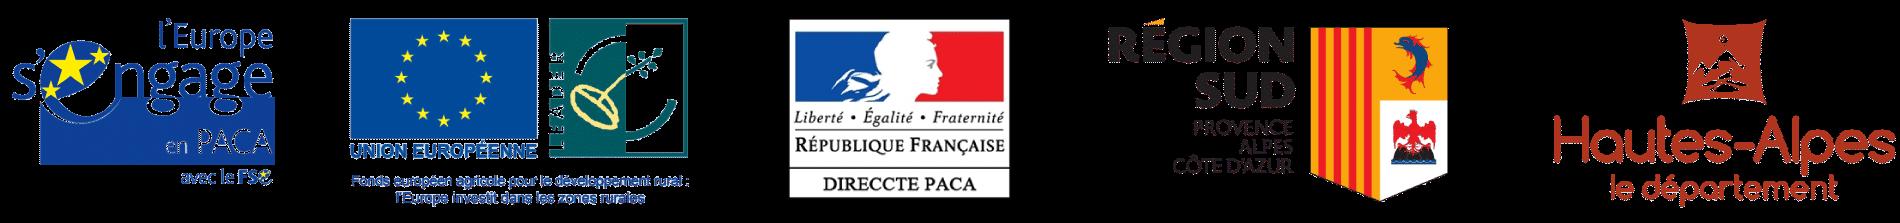 logo des partenaires financiers du gabion